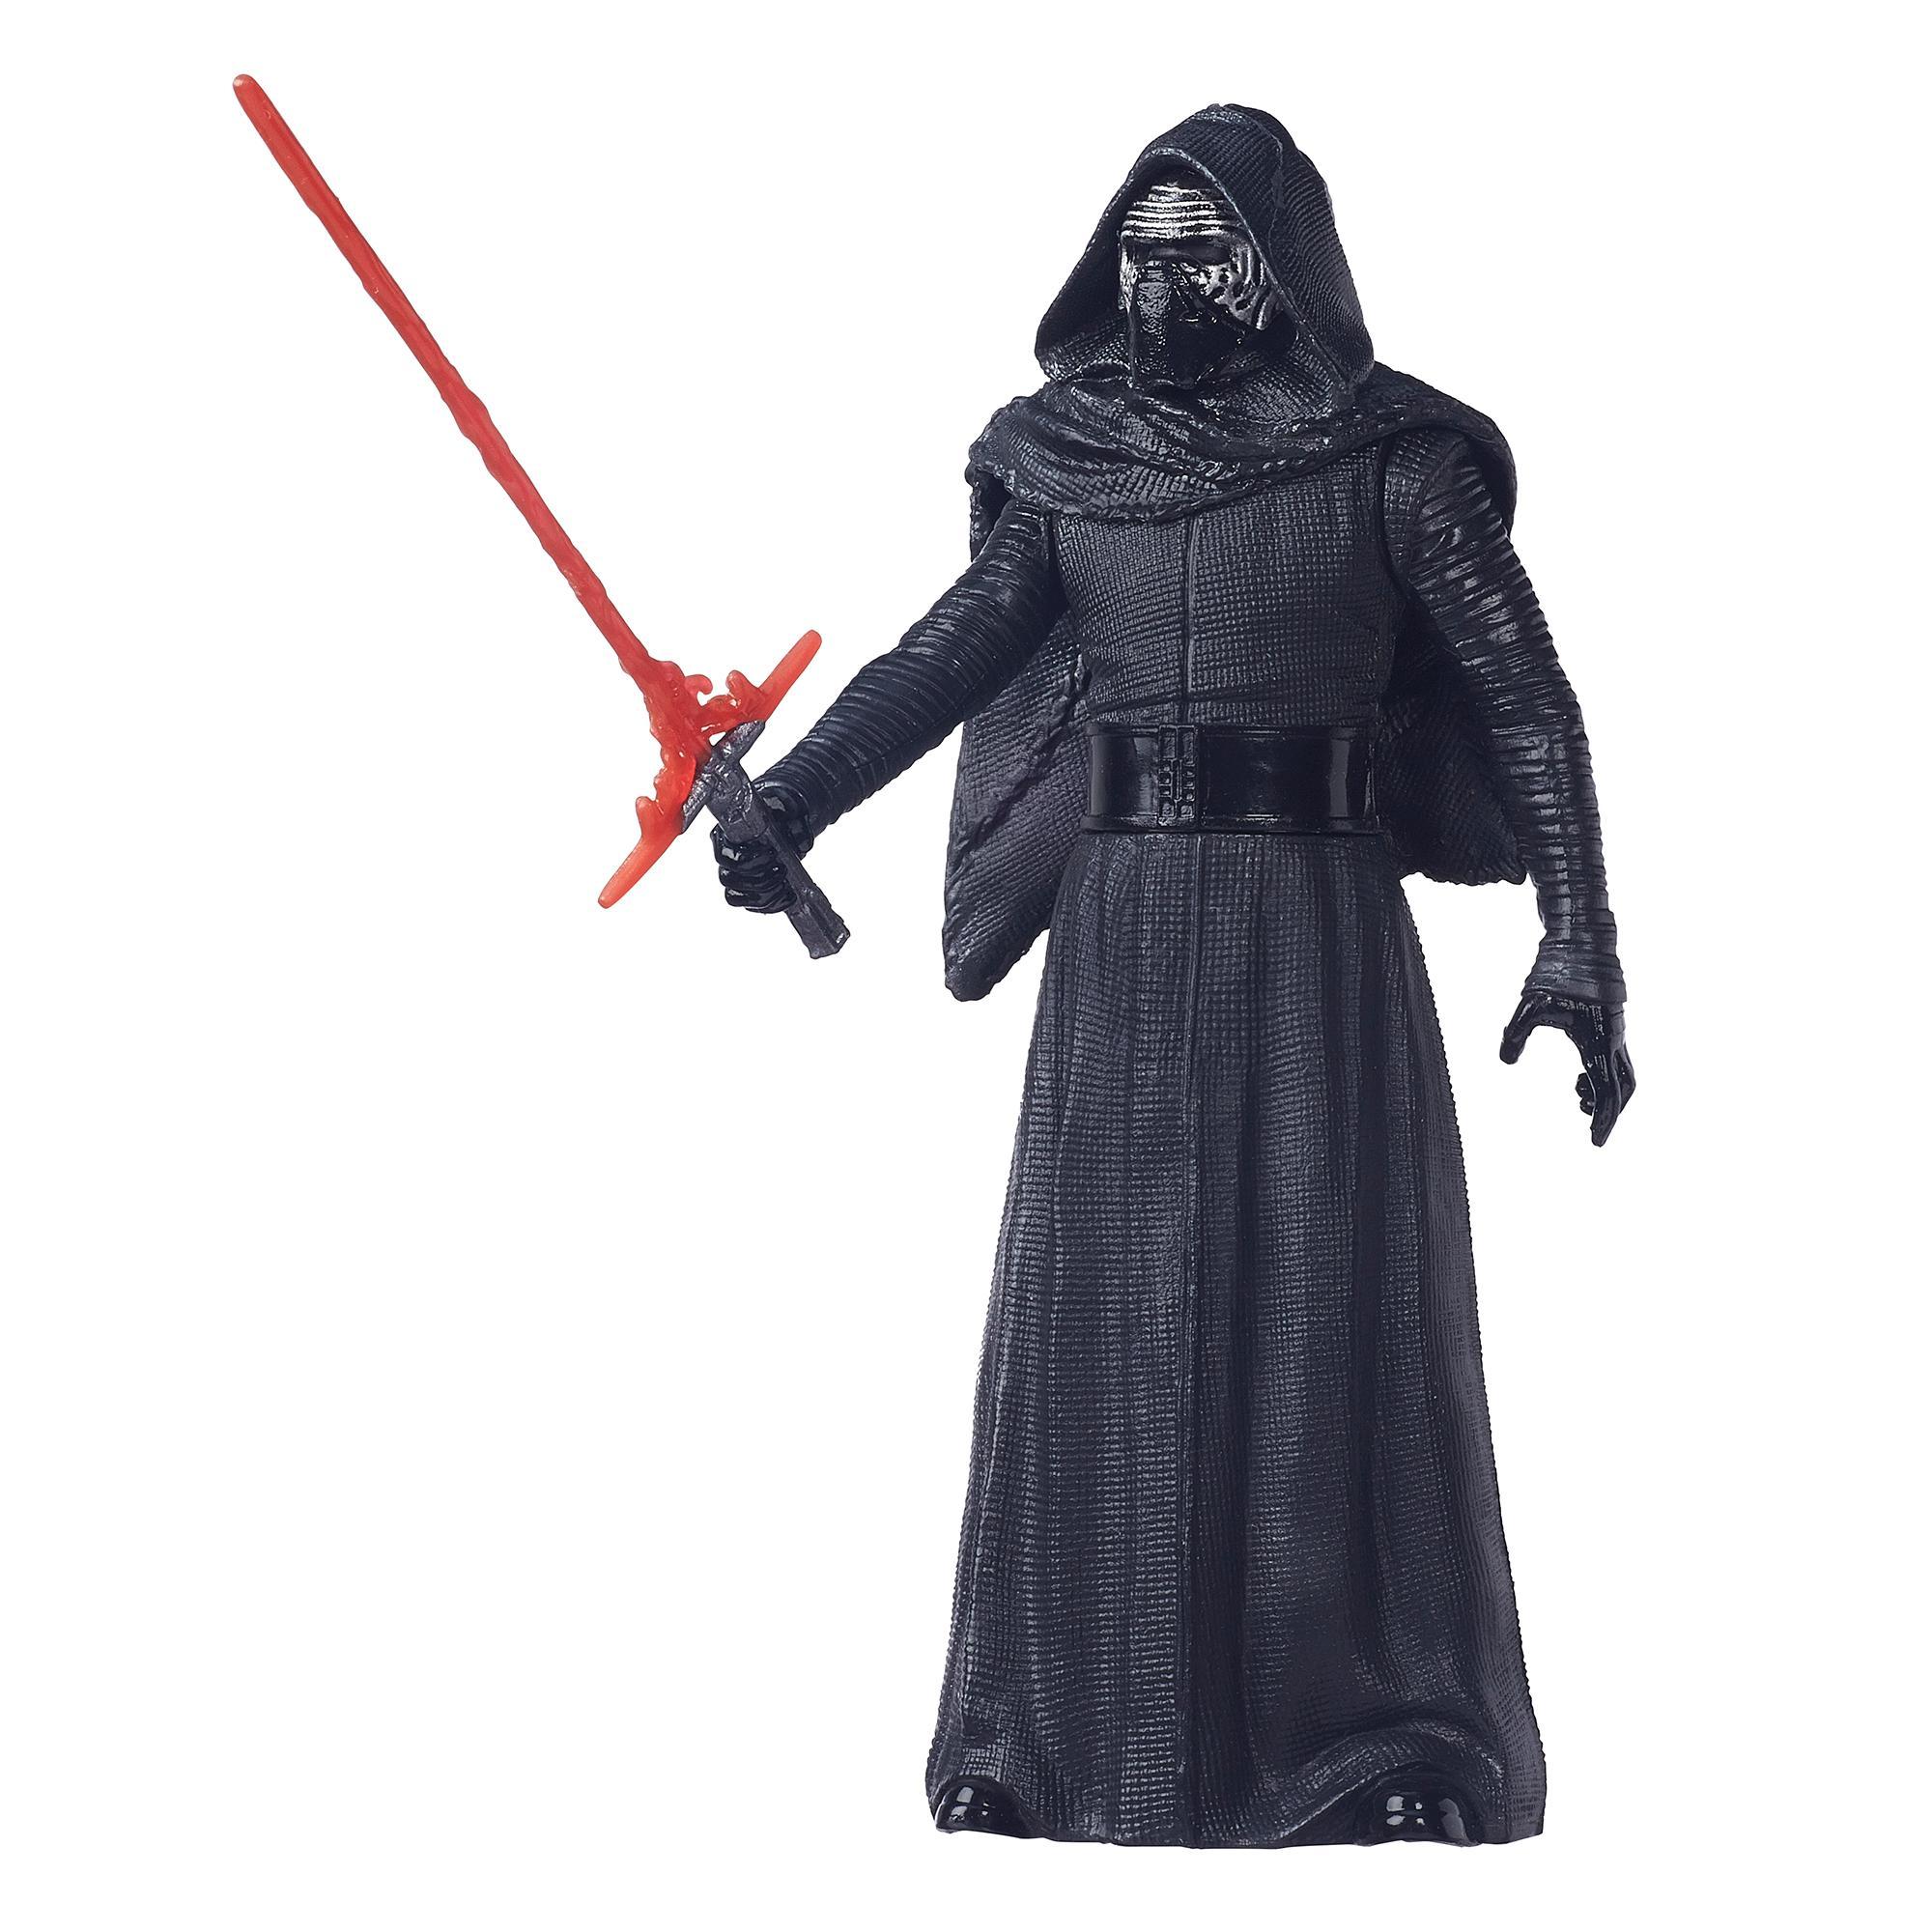 Star Wars: The Force Awakens 6-inch Kylo Ren